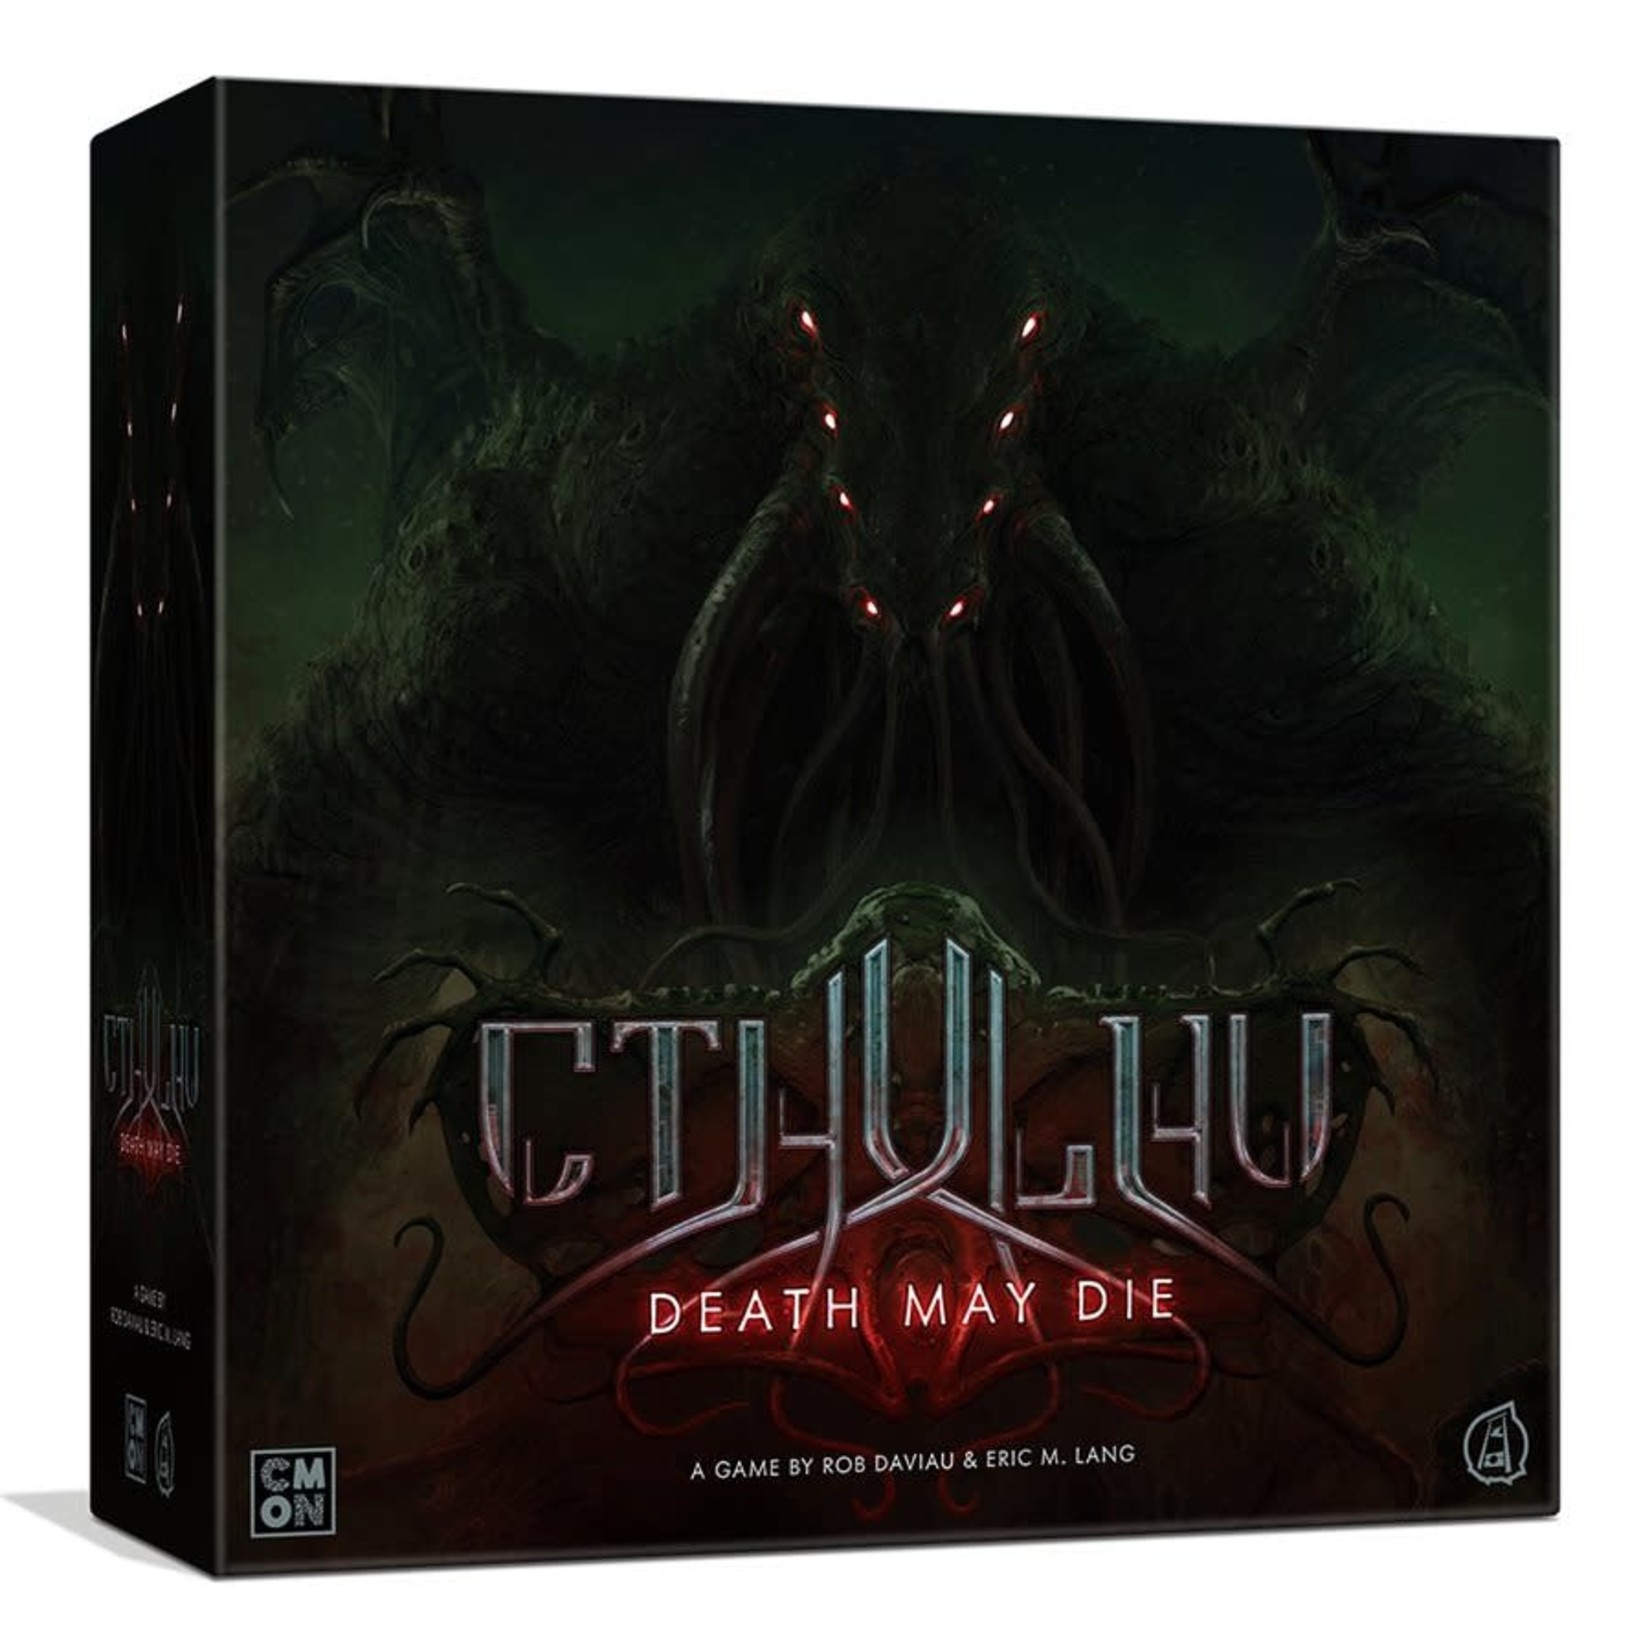 CMON Cthulhu: Death May Die (Anglais)